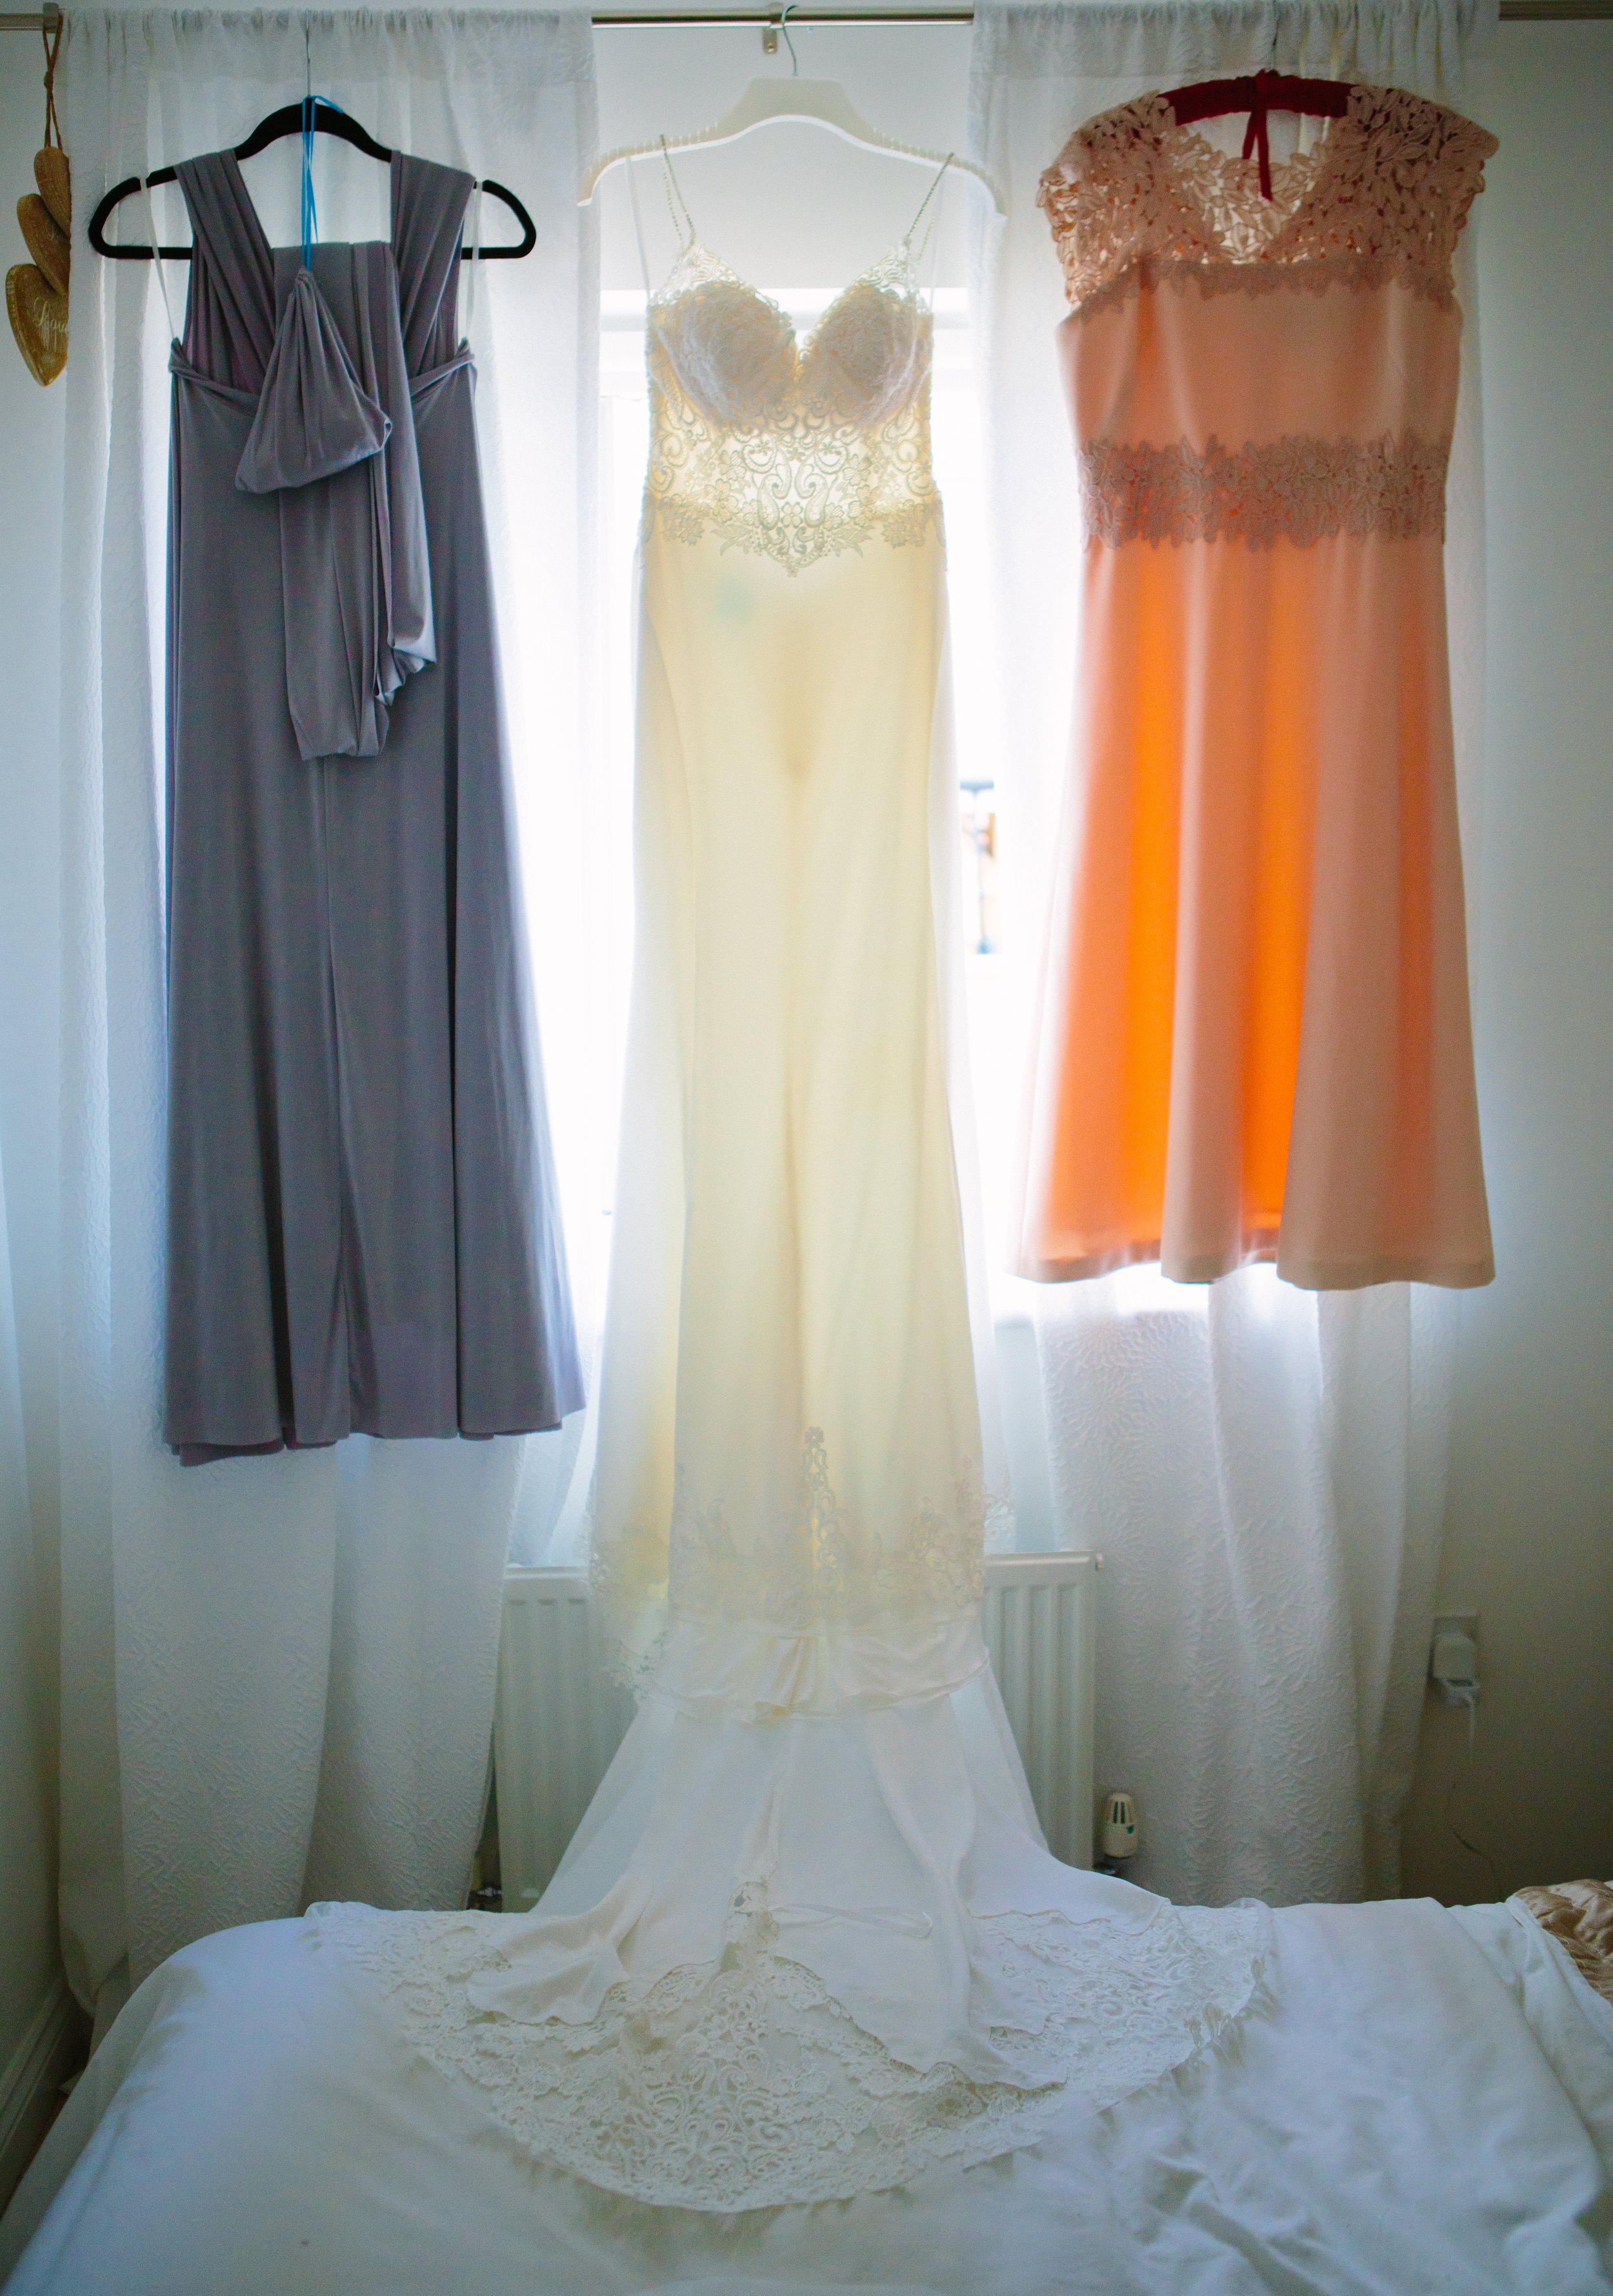 kent-wedding-photography-kingsnorth-brides-dress-05